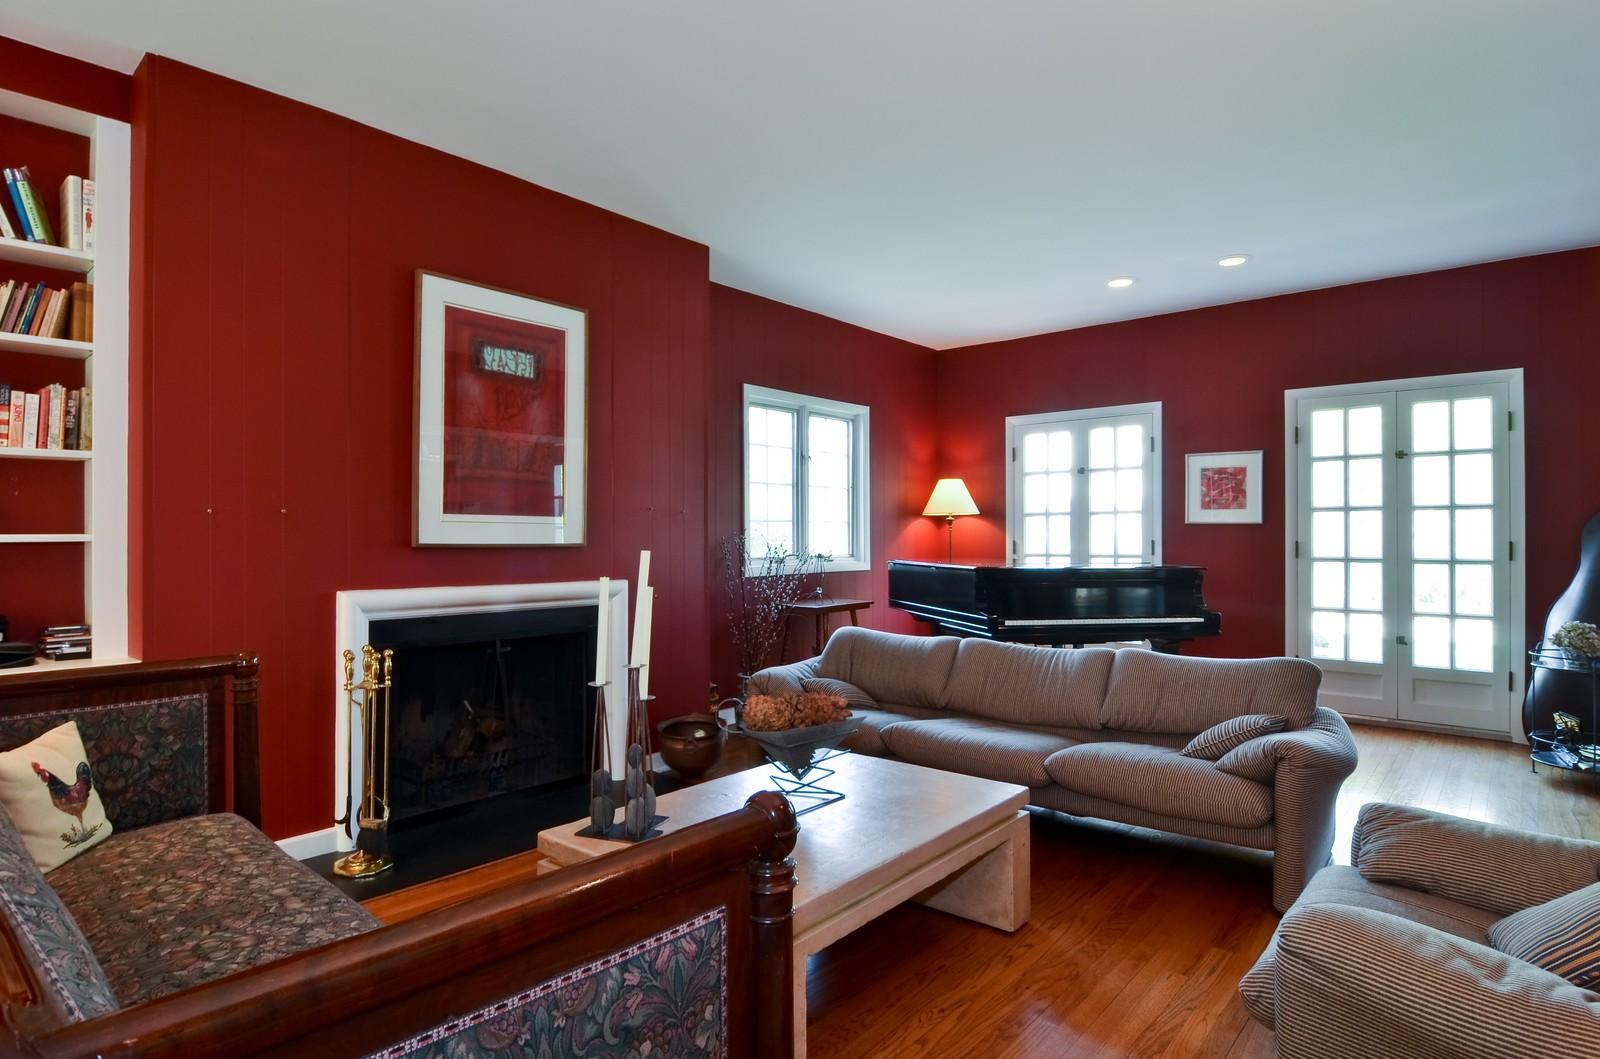 Real Estate Photography - 110 Crescent, Glencoe, IL, 60022 - Living Room